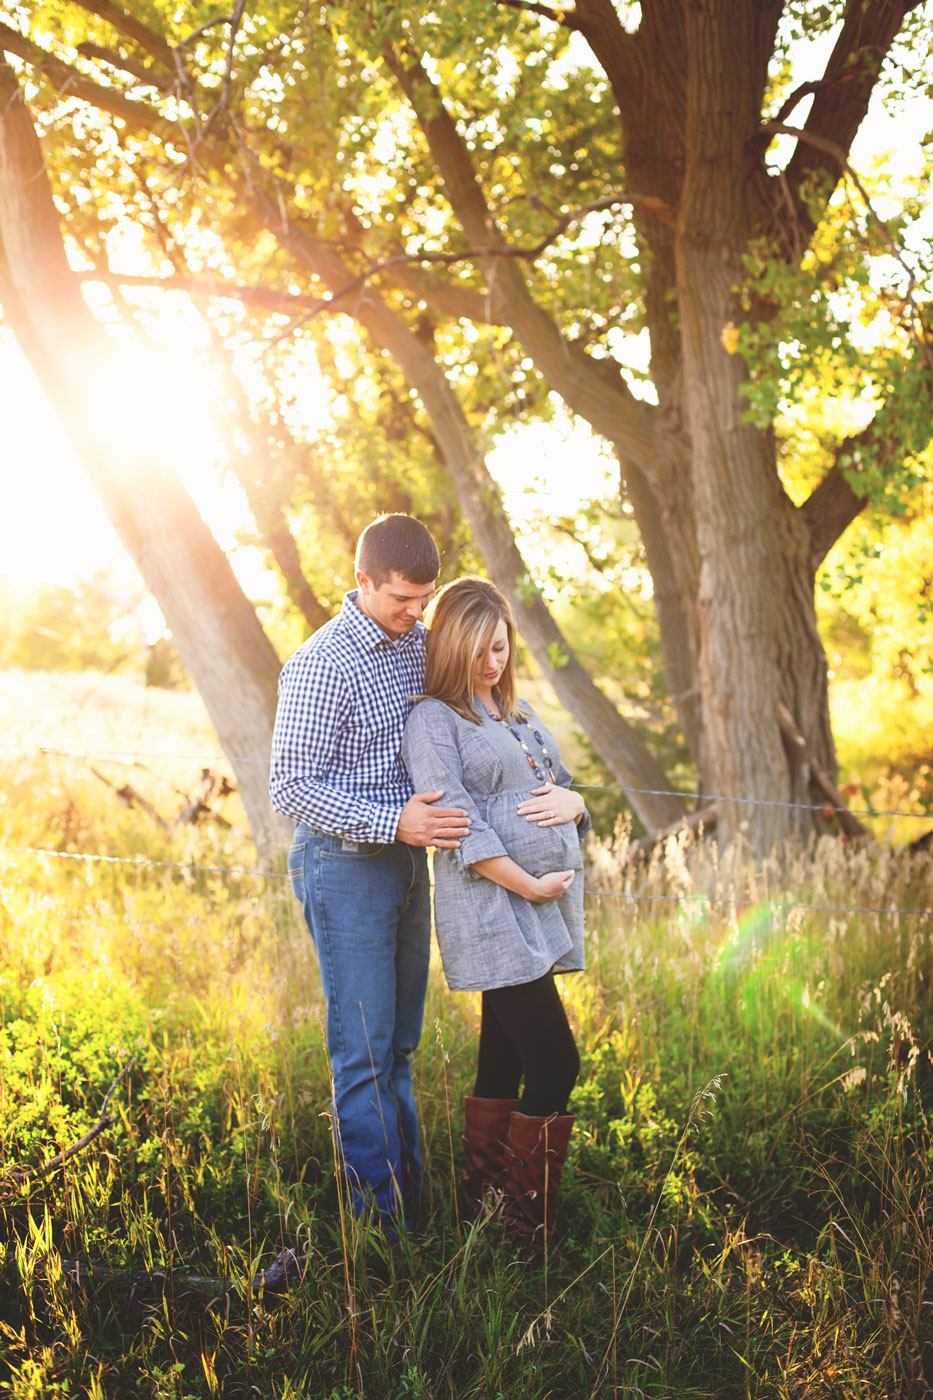 Russtanna_Photography_Loshonkohl_maternity-6.jpg